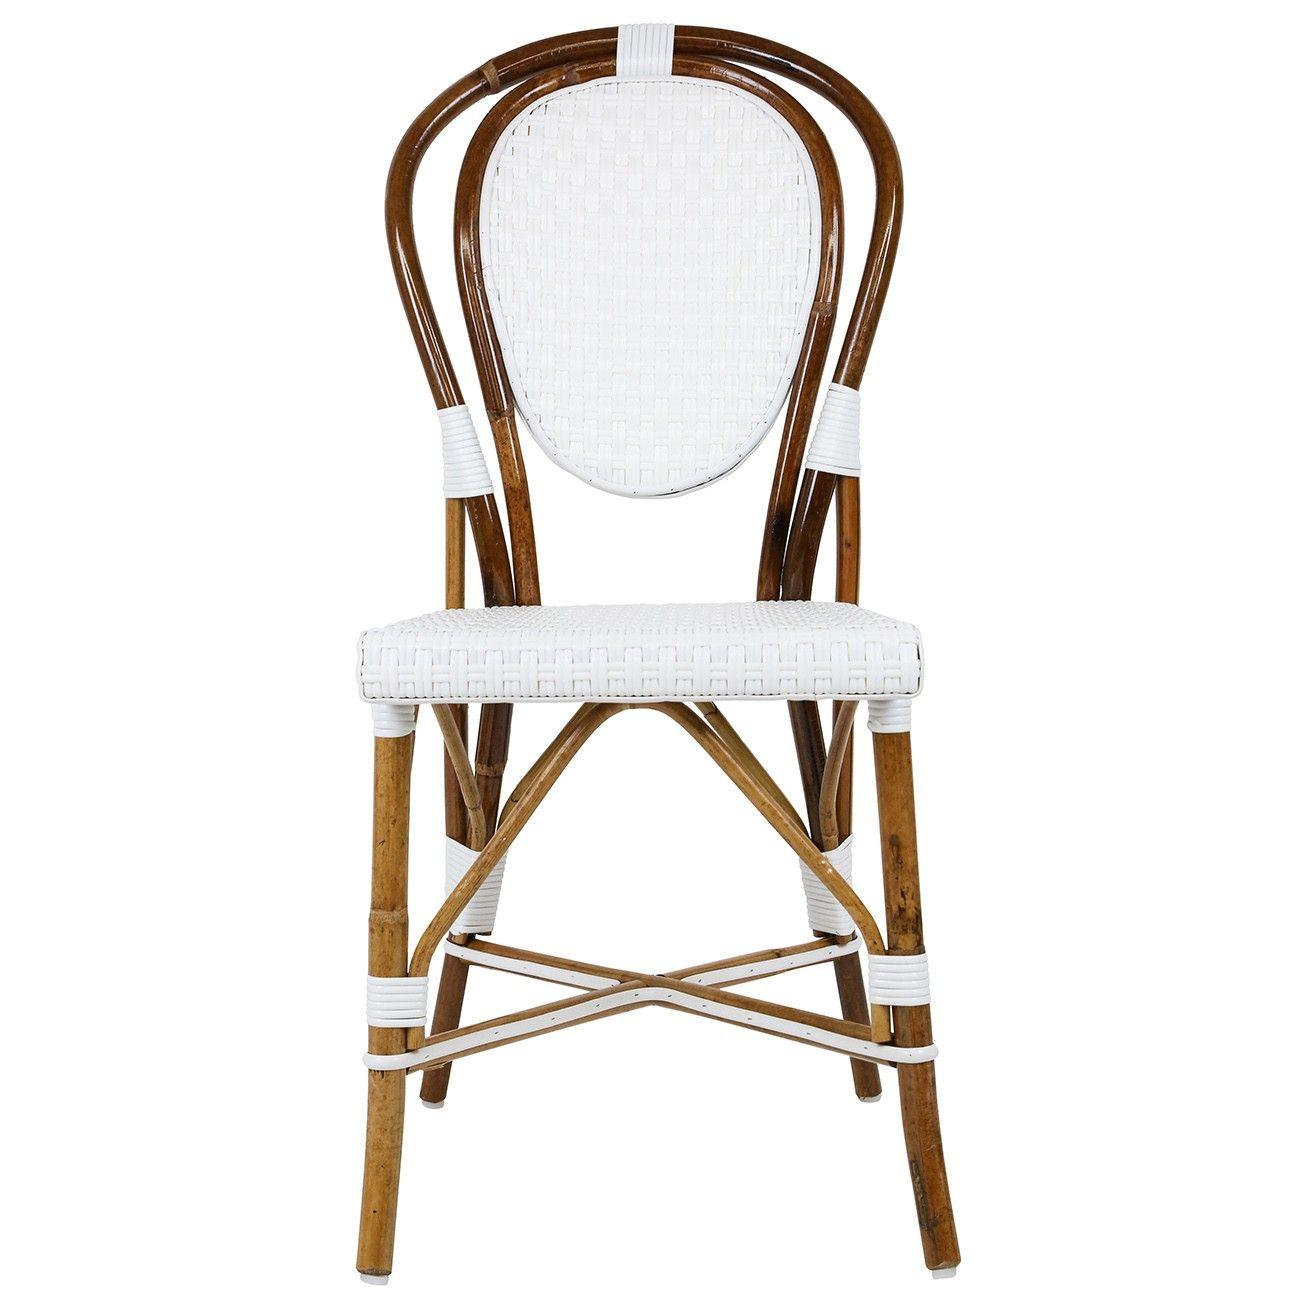 Prime White Mediterranean Bistro Chair E Maison Midi Is The High Home Interior And Landscaping Ponolsignezvosmurscom